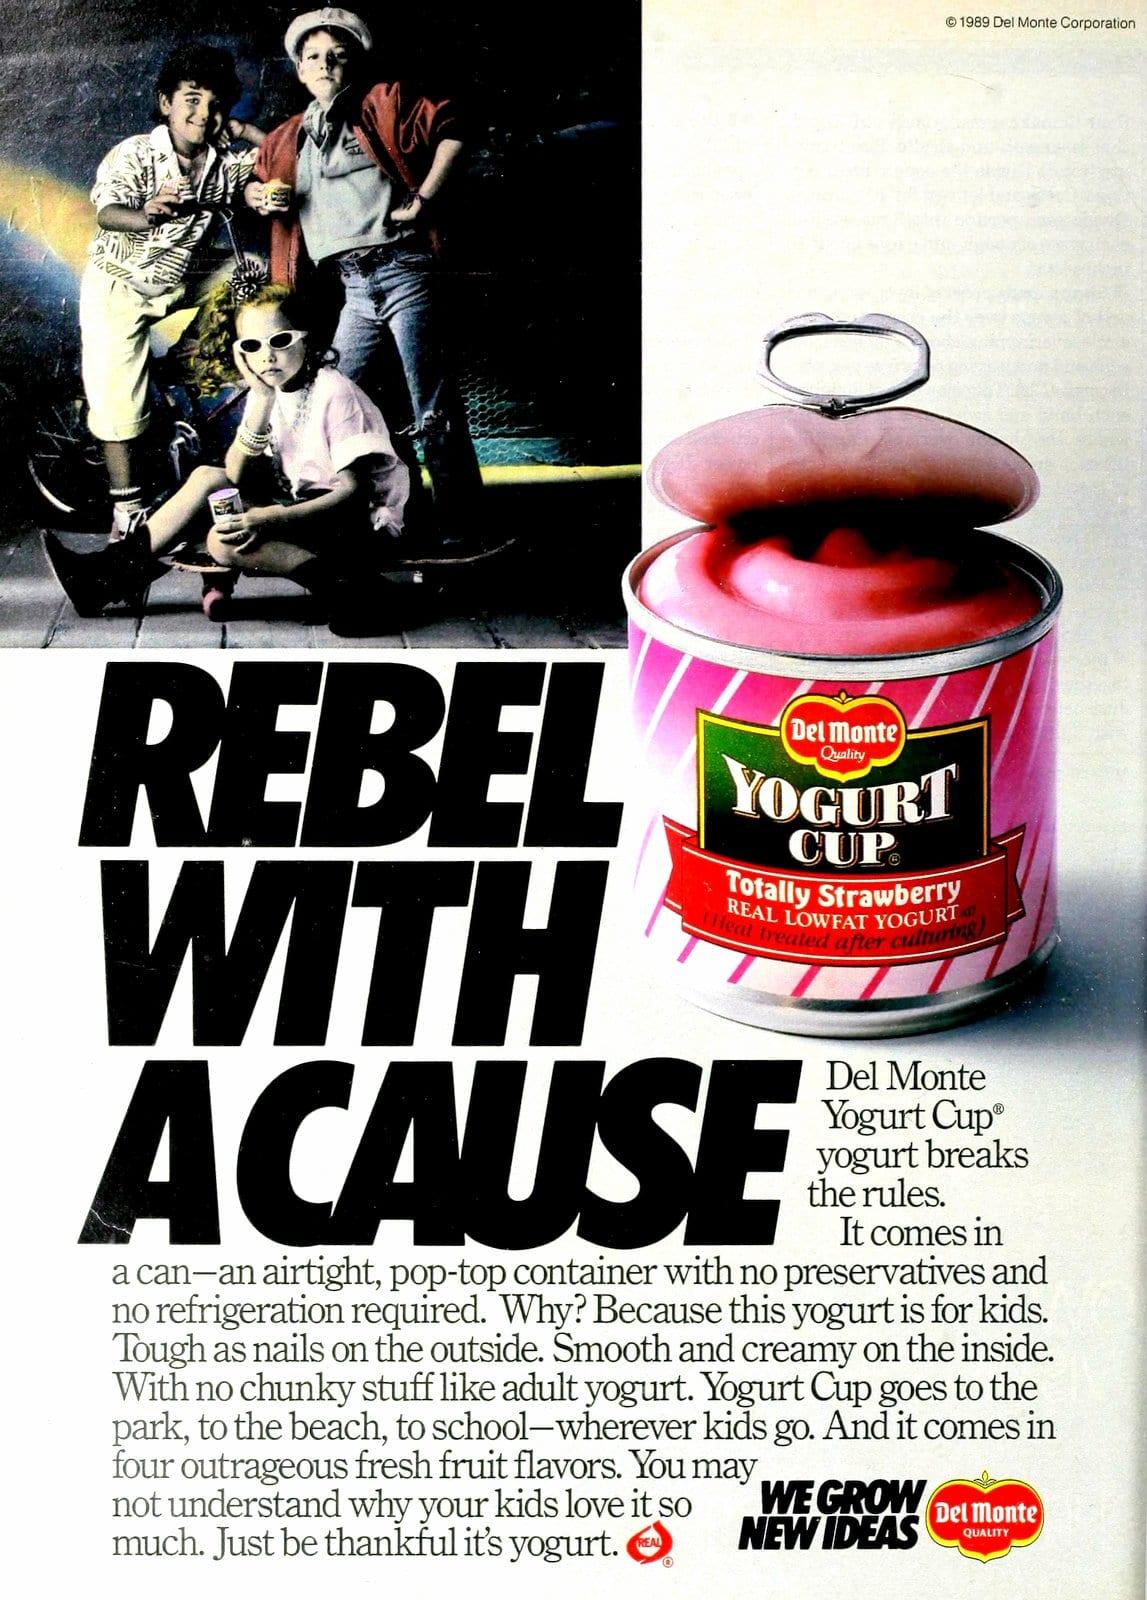 Del Monte Totally Strawberry yogurt cup (1989)